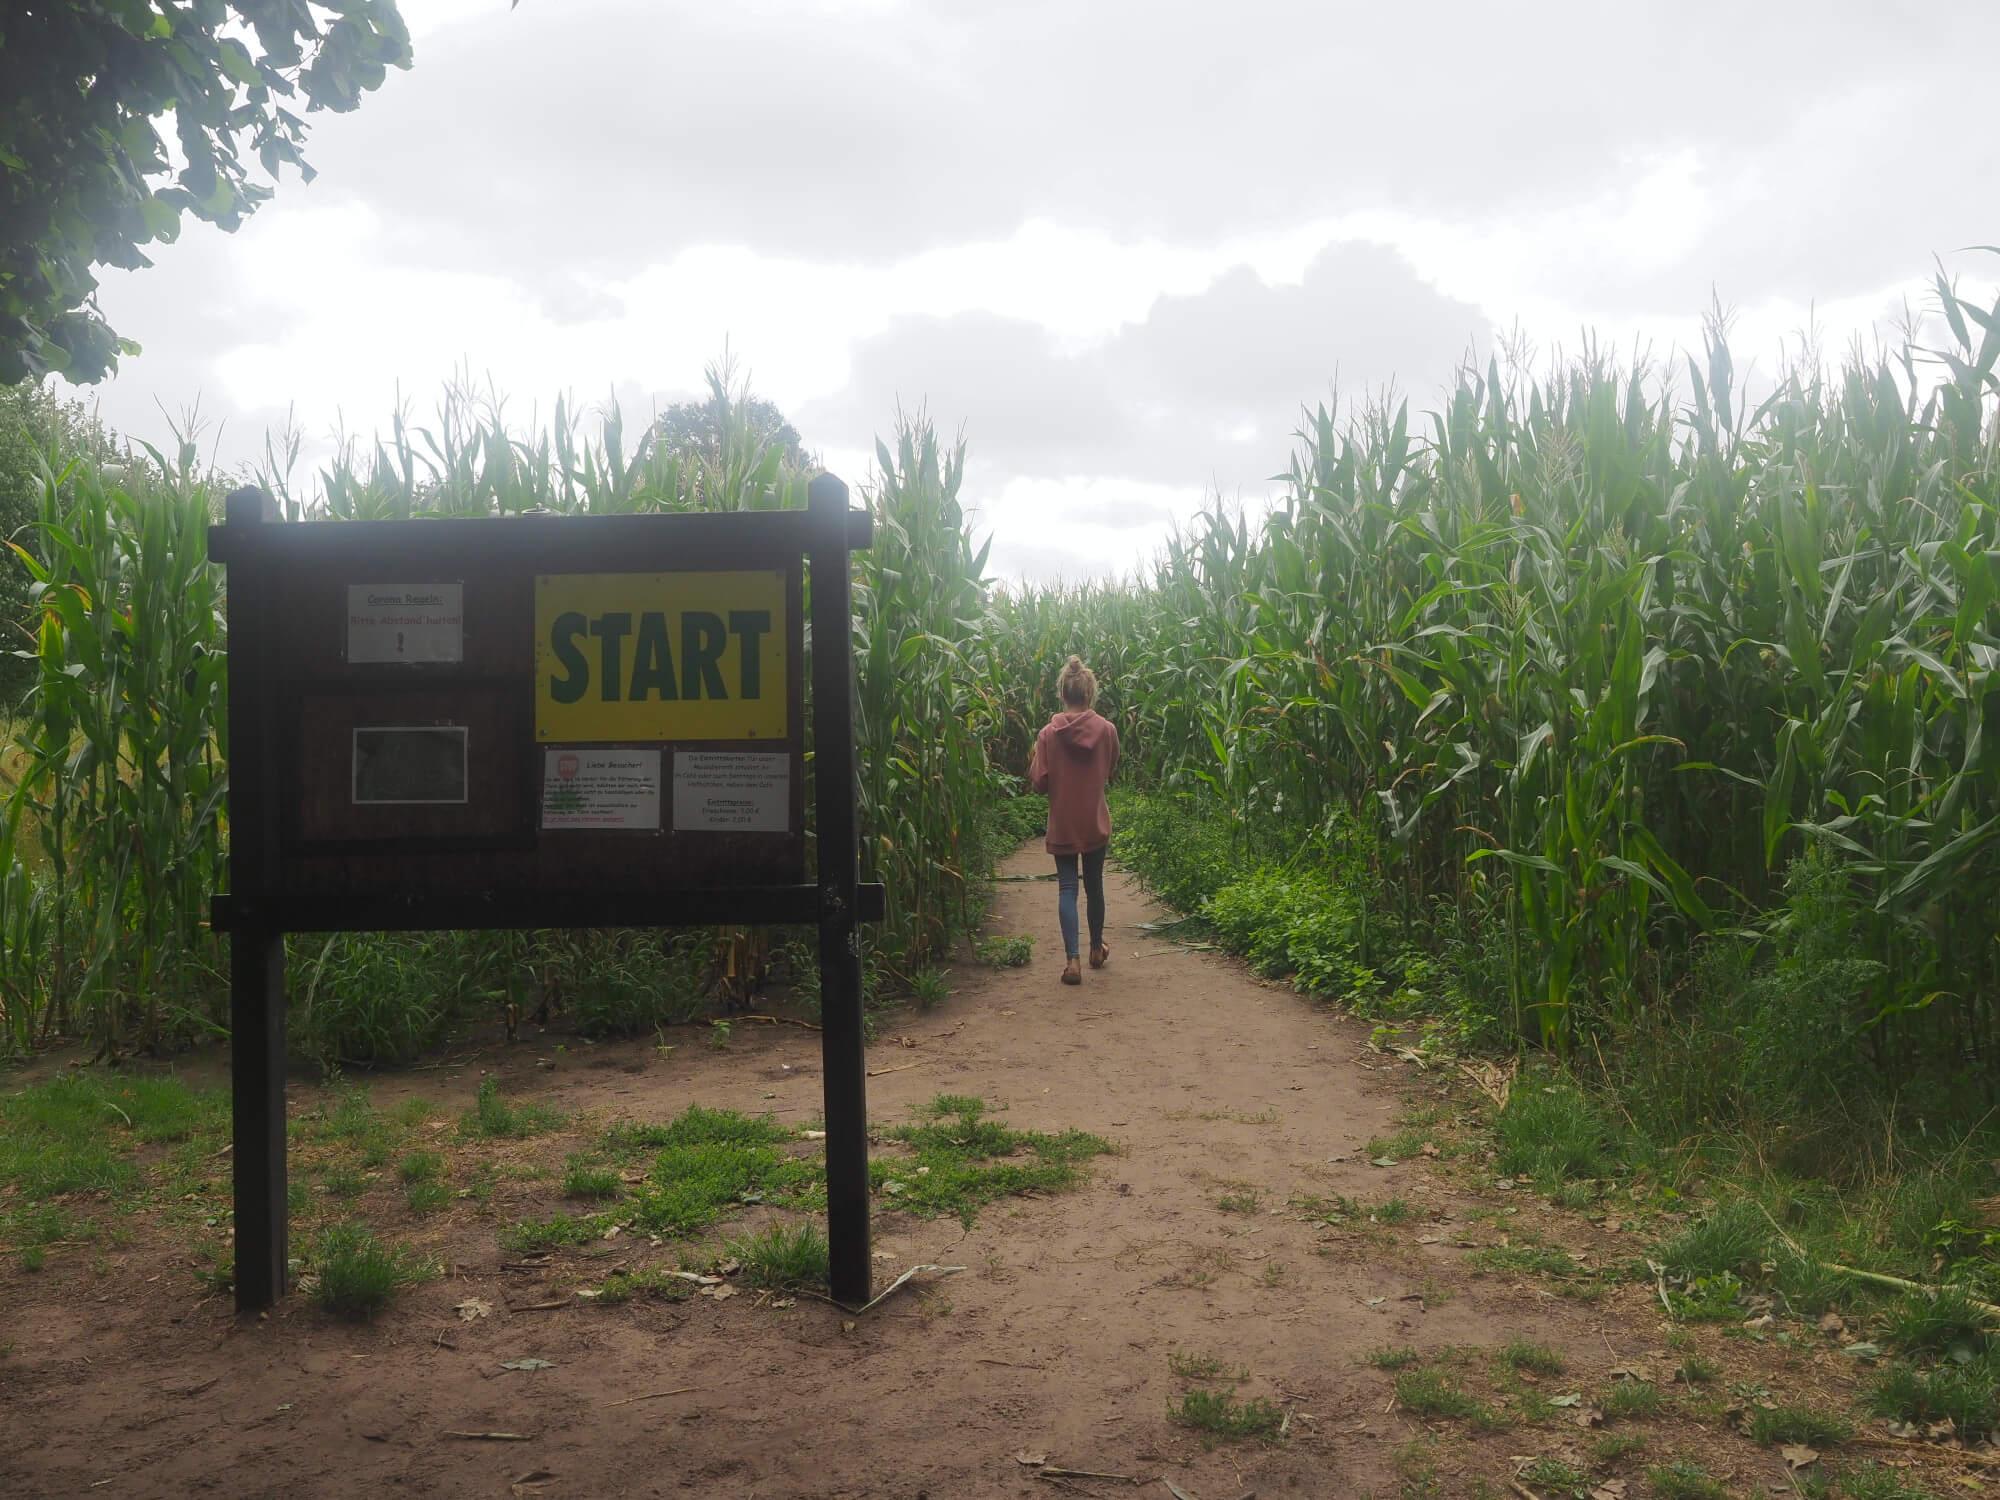 Maislabyrinth Meutstege im Emsland